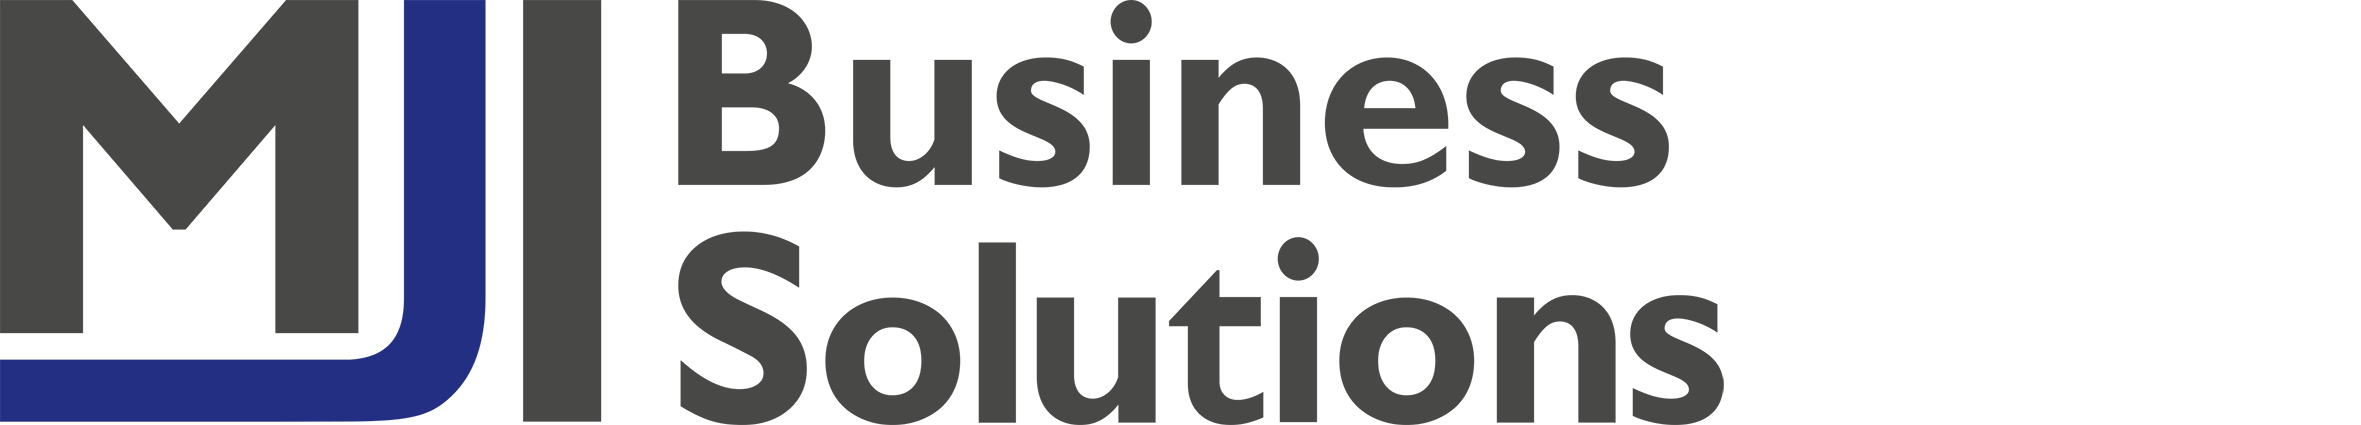 mji-solutions_logo_srgb.png